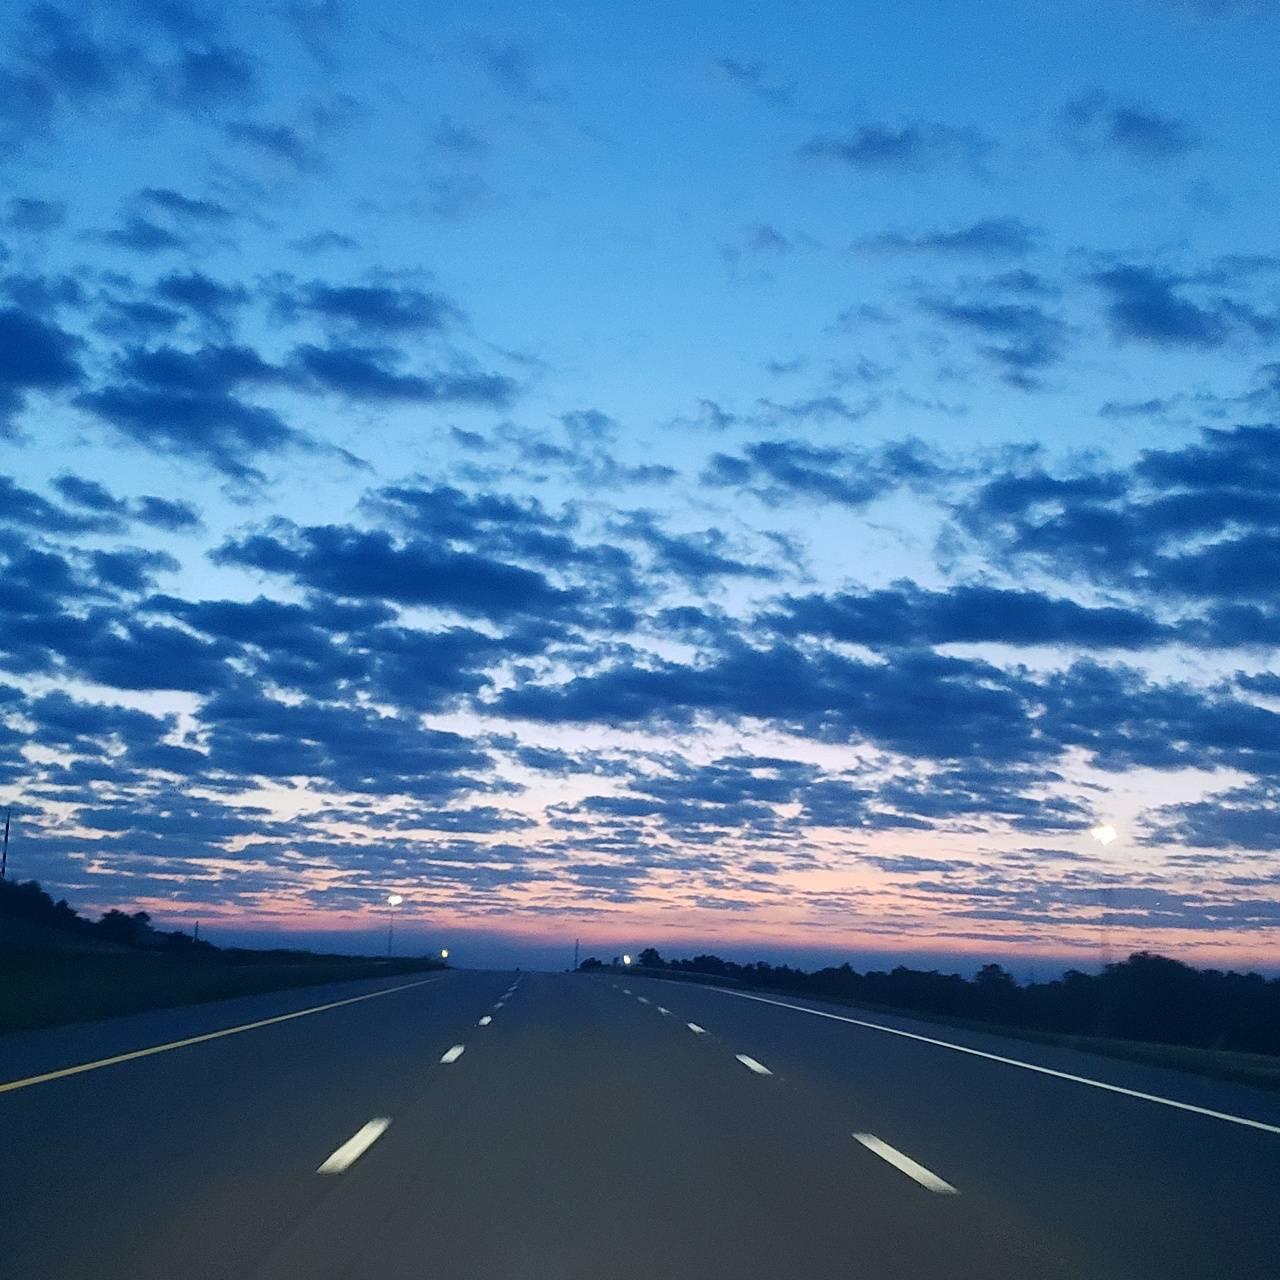 Sunset roadtrip